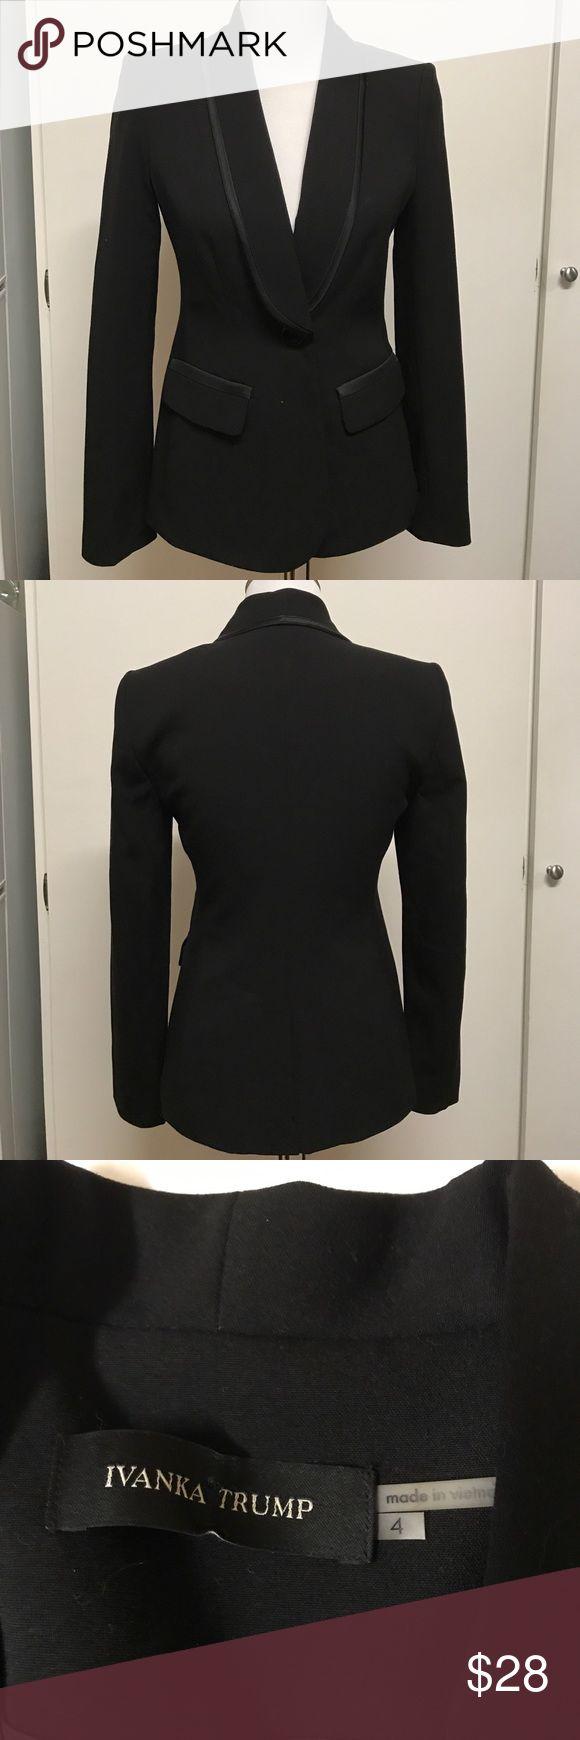 IVANCA TRUMP JACKET IVANCA TRUMP JACKET Goog condition IVANCA TRUMP Jackets & Coats Blazers